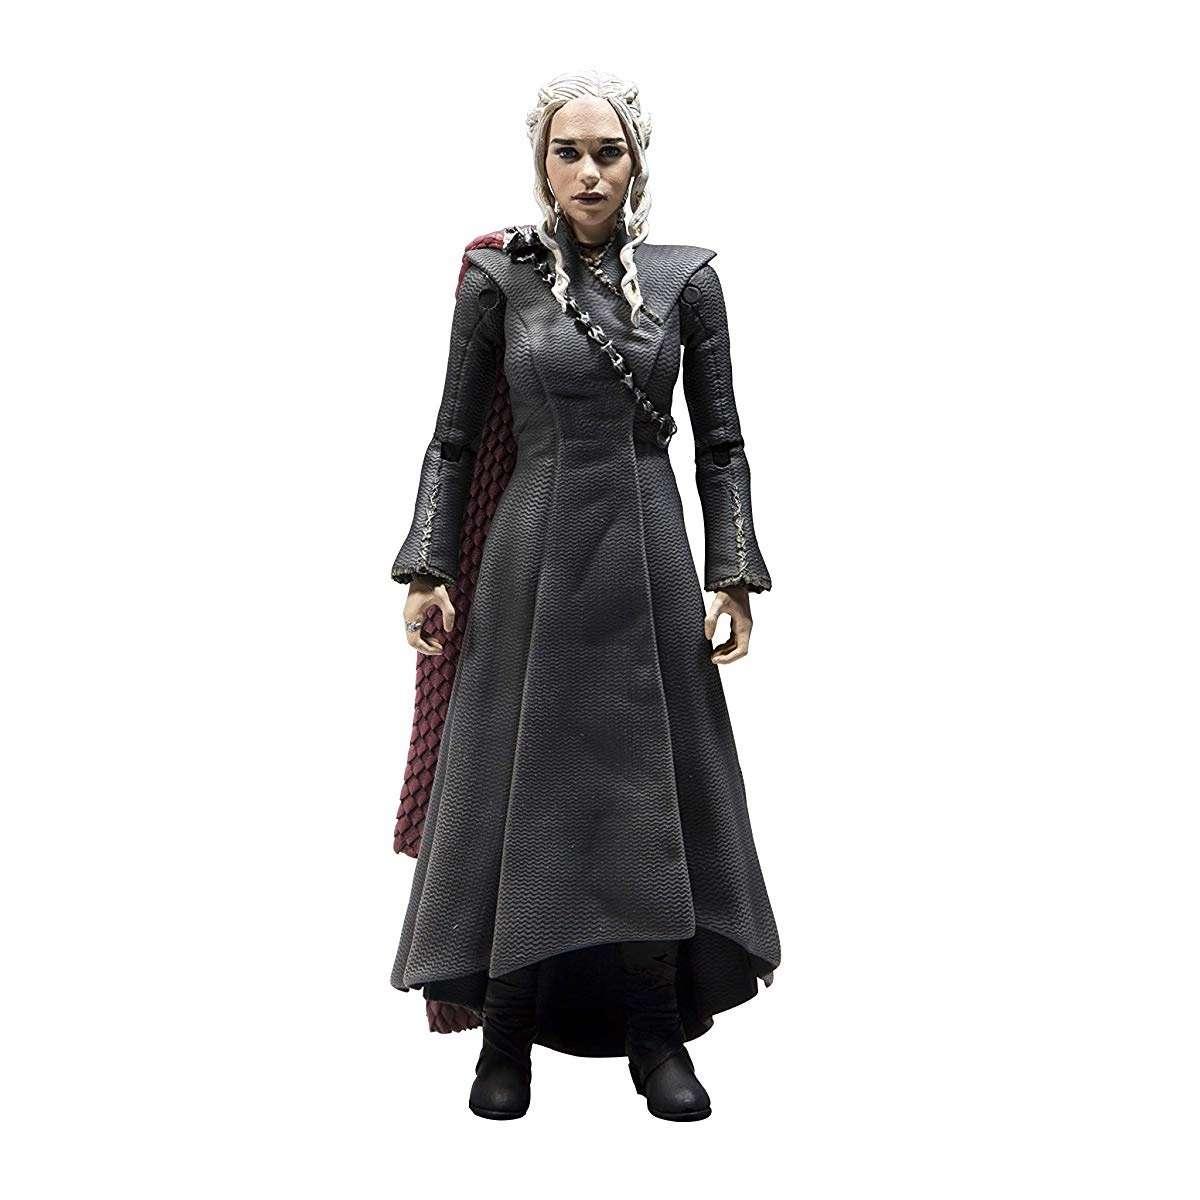 Action Figure: Game of Thrones - Daenerys Targaryen Photo